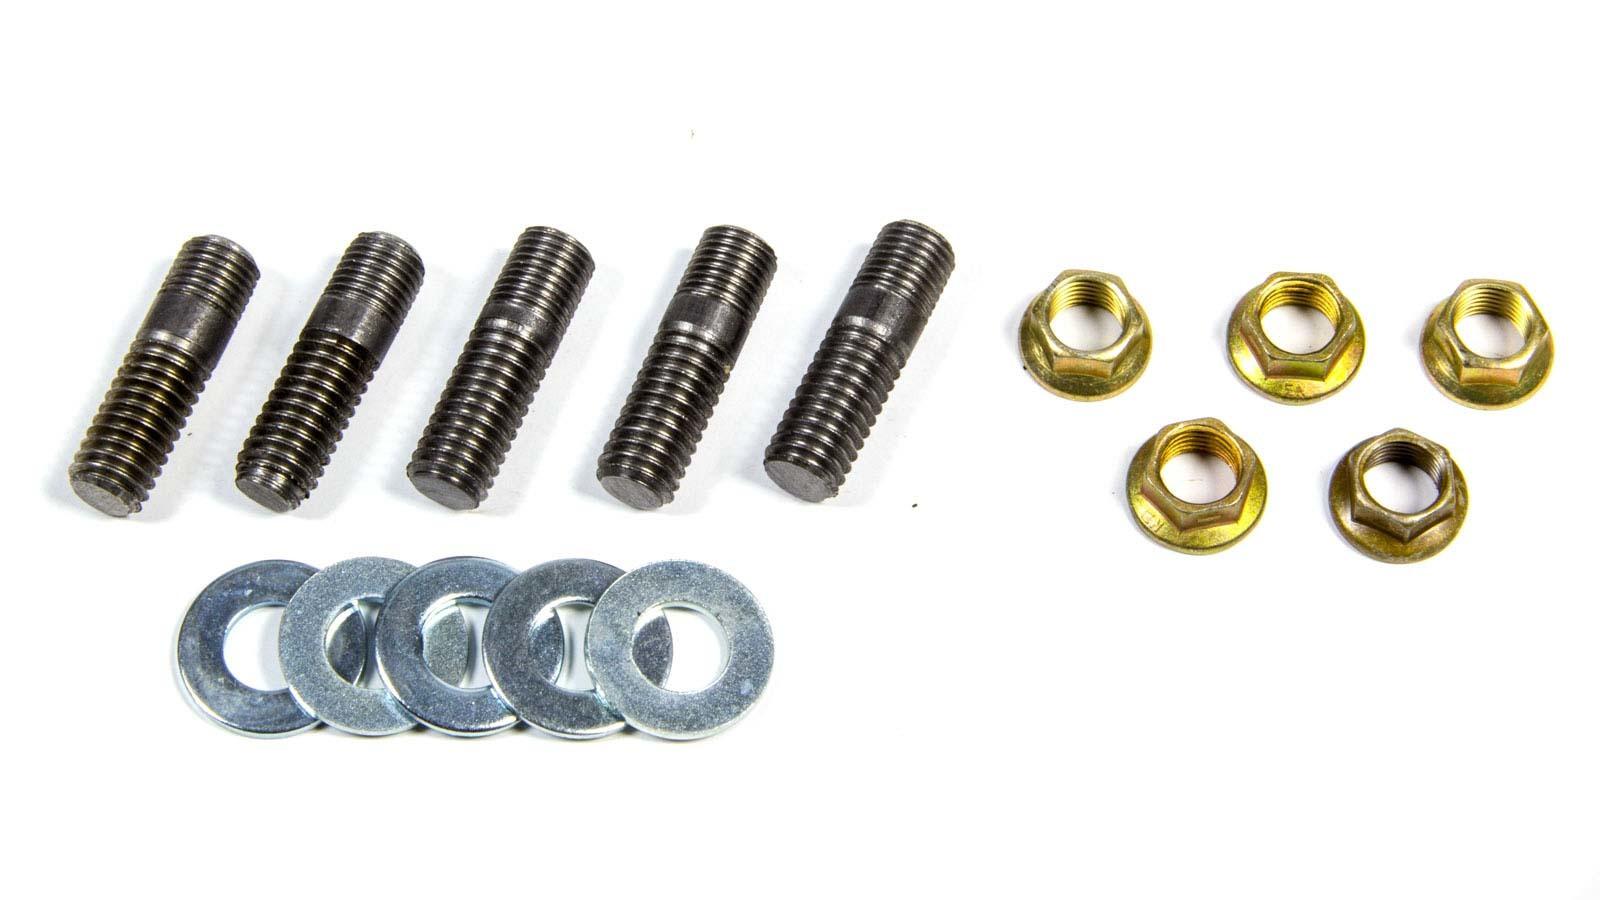 Weld Racing 3/8-24 Rotor Stud Kit w/Nuts & Washers (5pk)